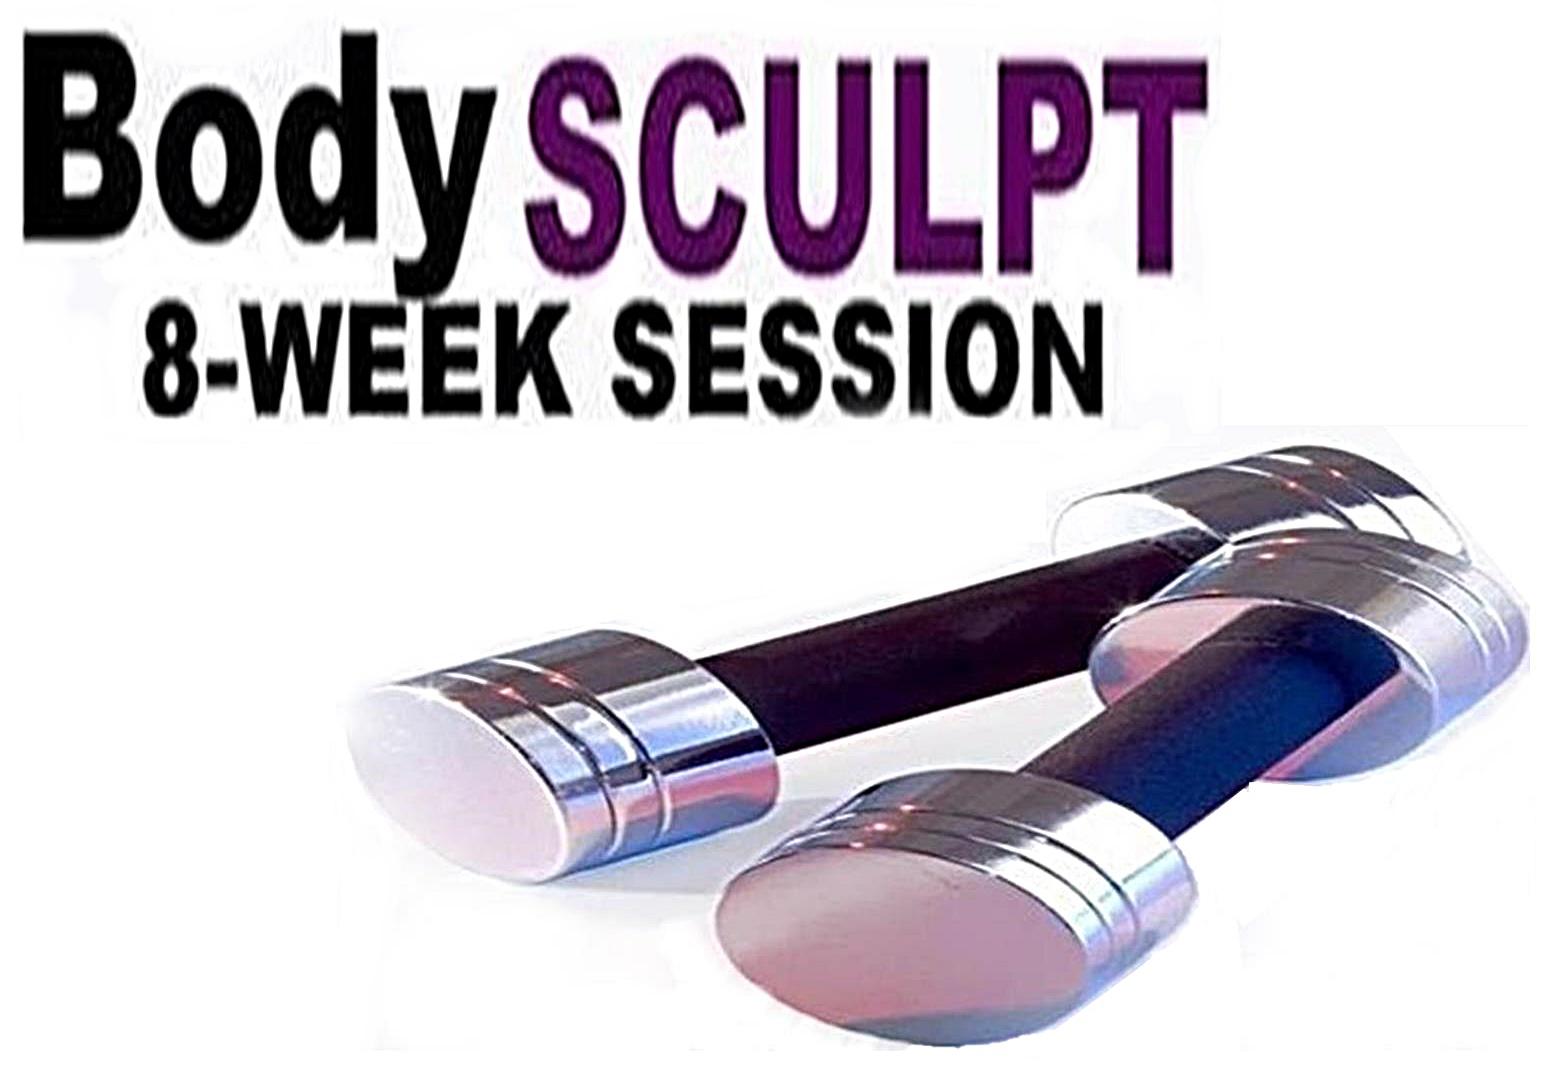 8-week Body Sculpt Class, 40-Below Fitness, Fairbanks Alaska